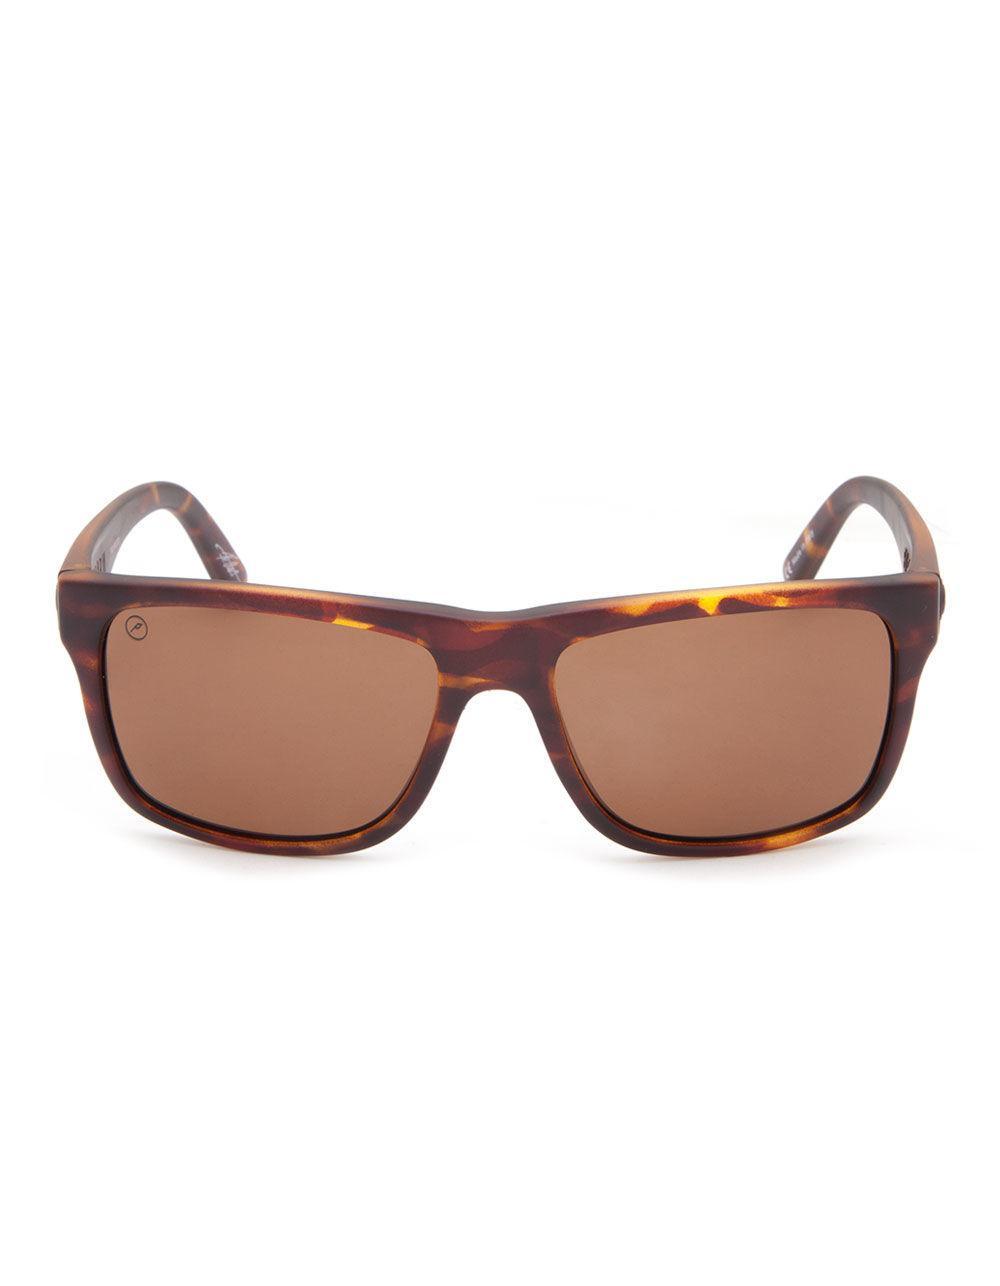 ed163cb0398a Lyst - Electric Swingarm Polarized Sunglasses for Men